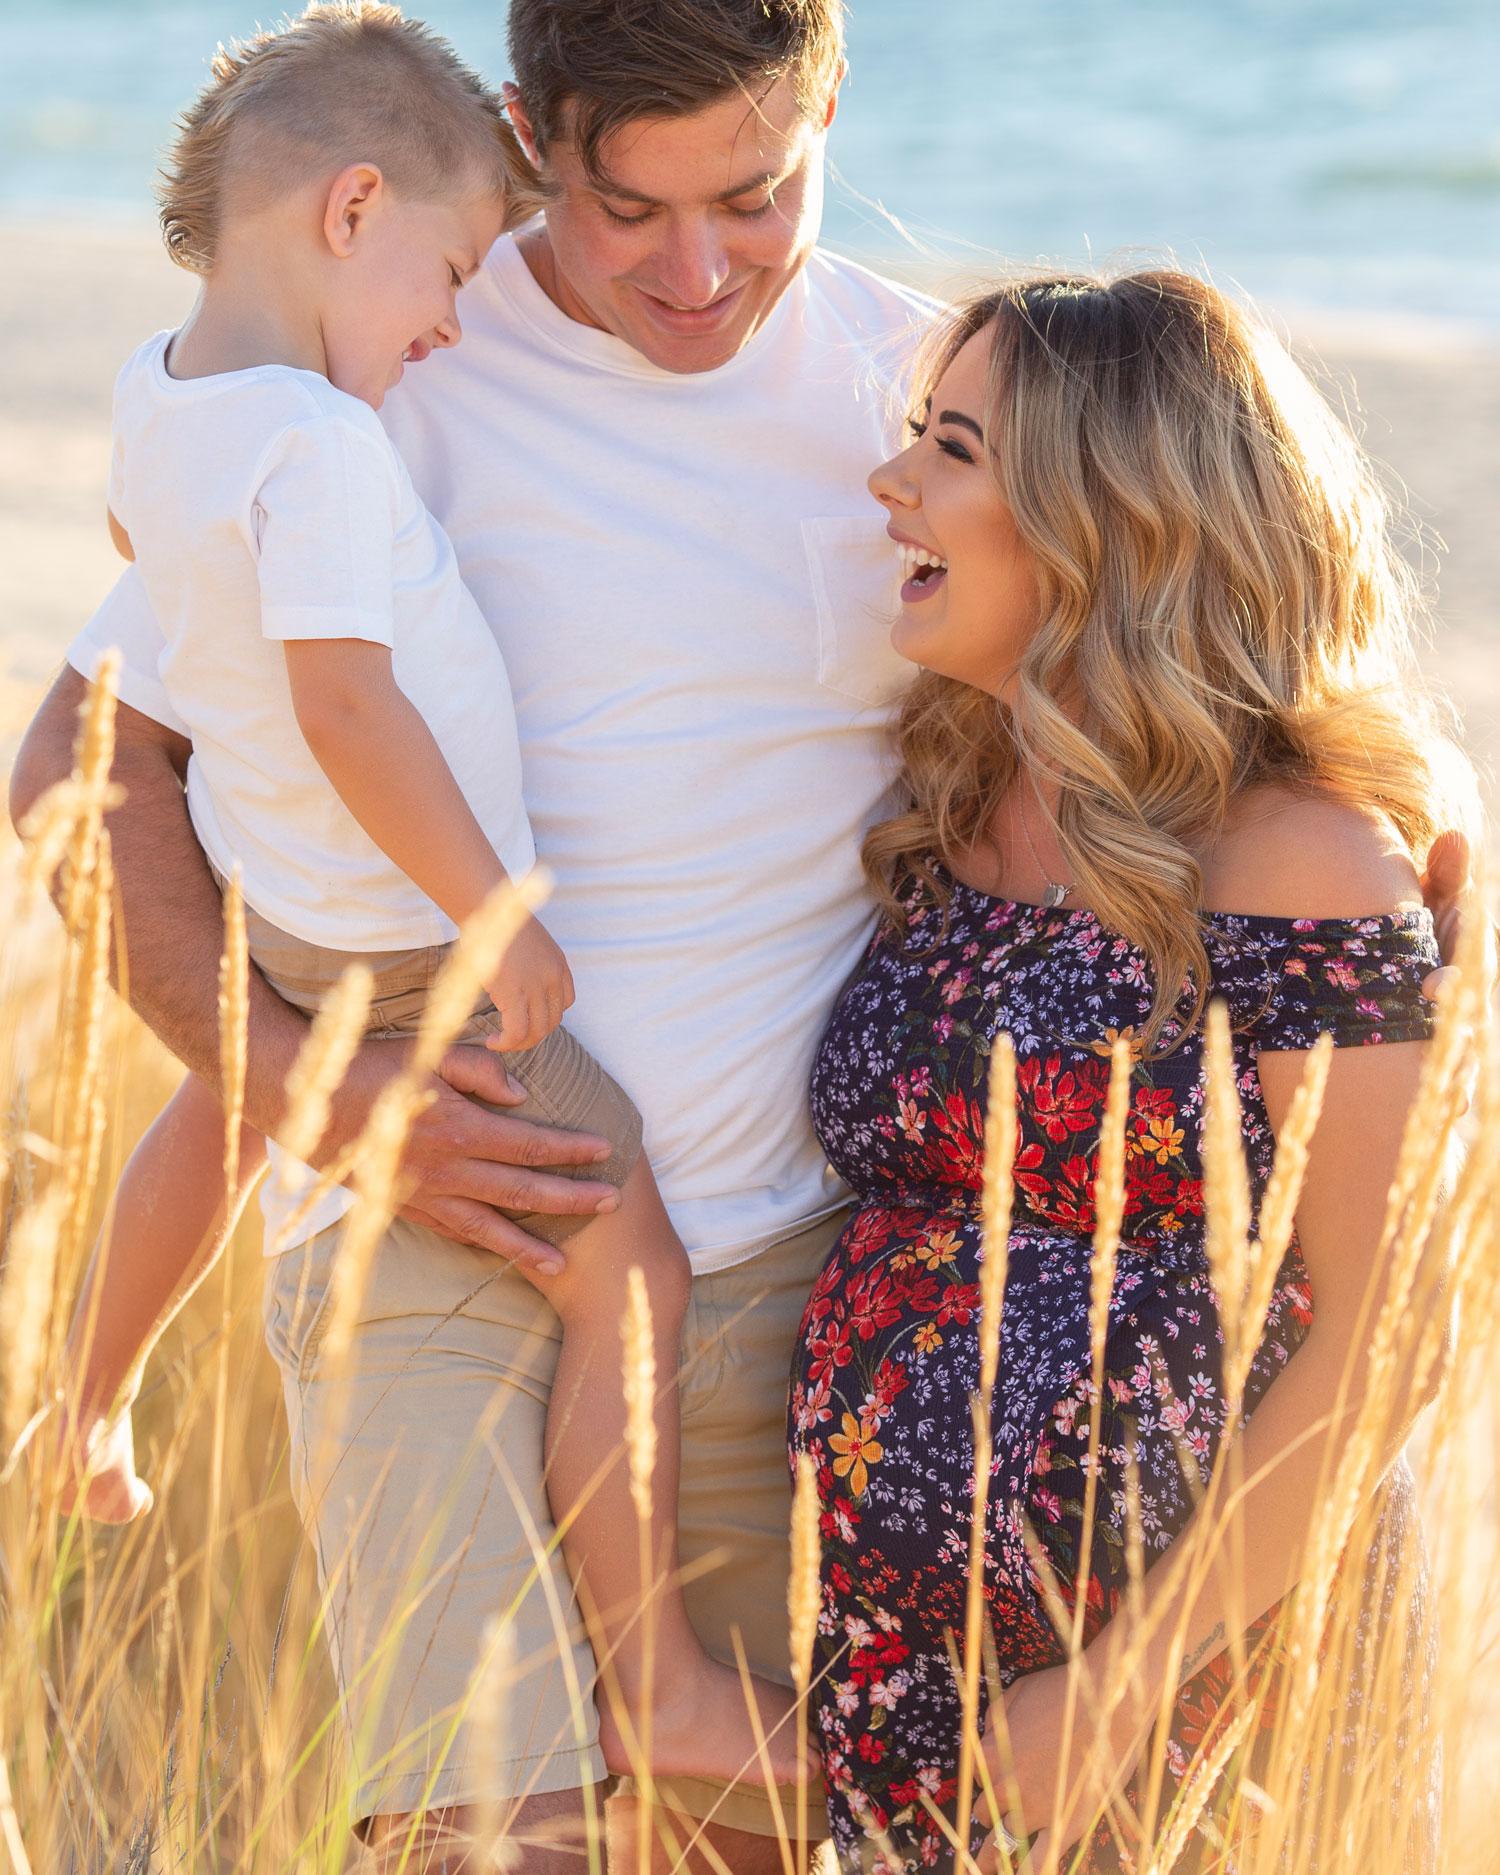 Bunbury-Beach-Family-Maternity-Portrait-1.jpg